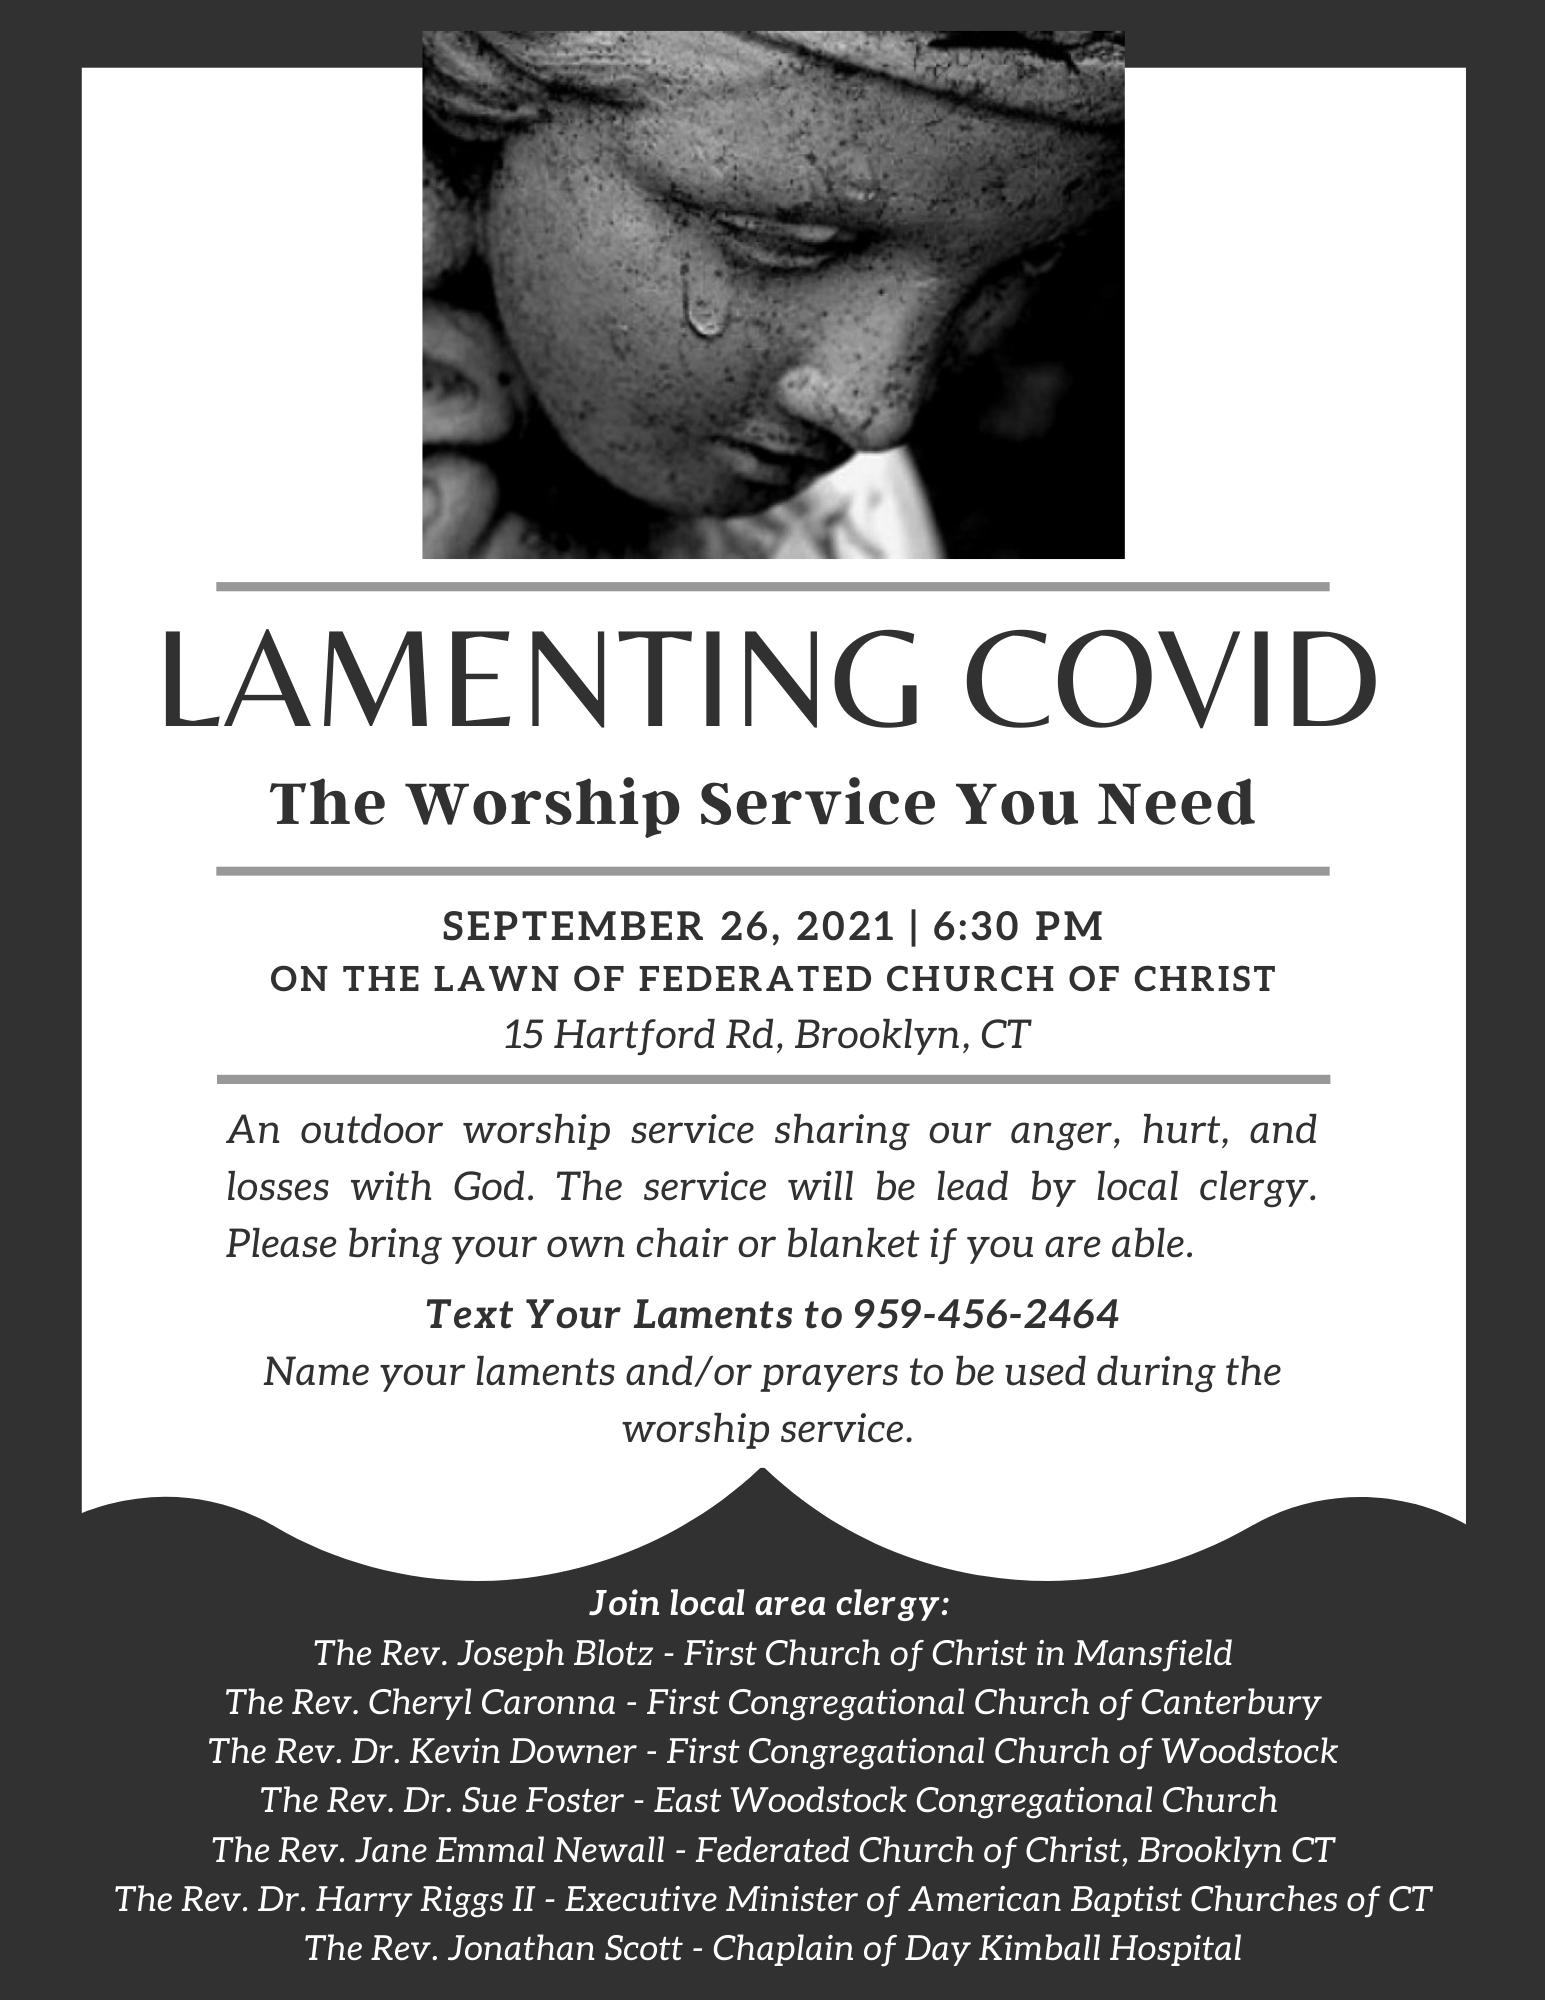 Lamenting Covid Flyer (1)